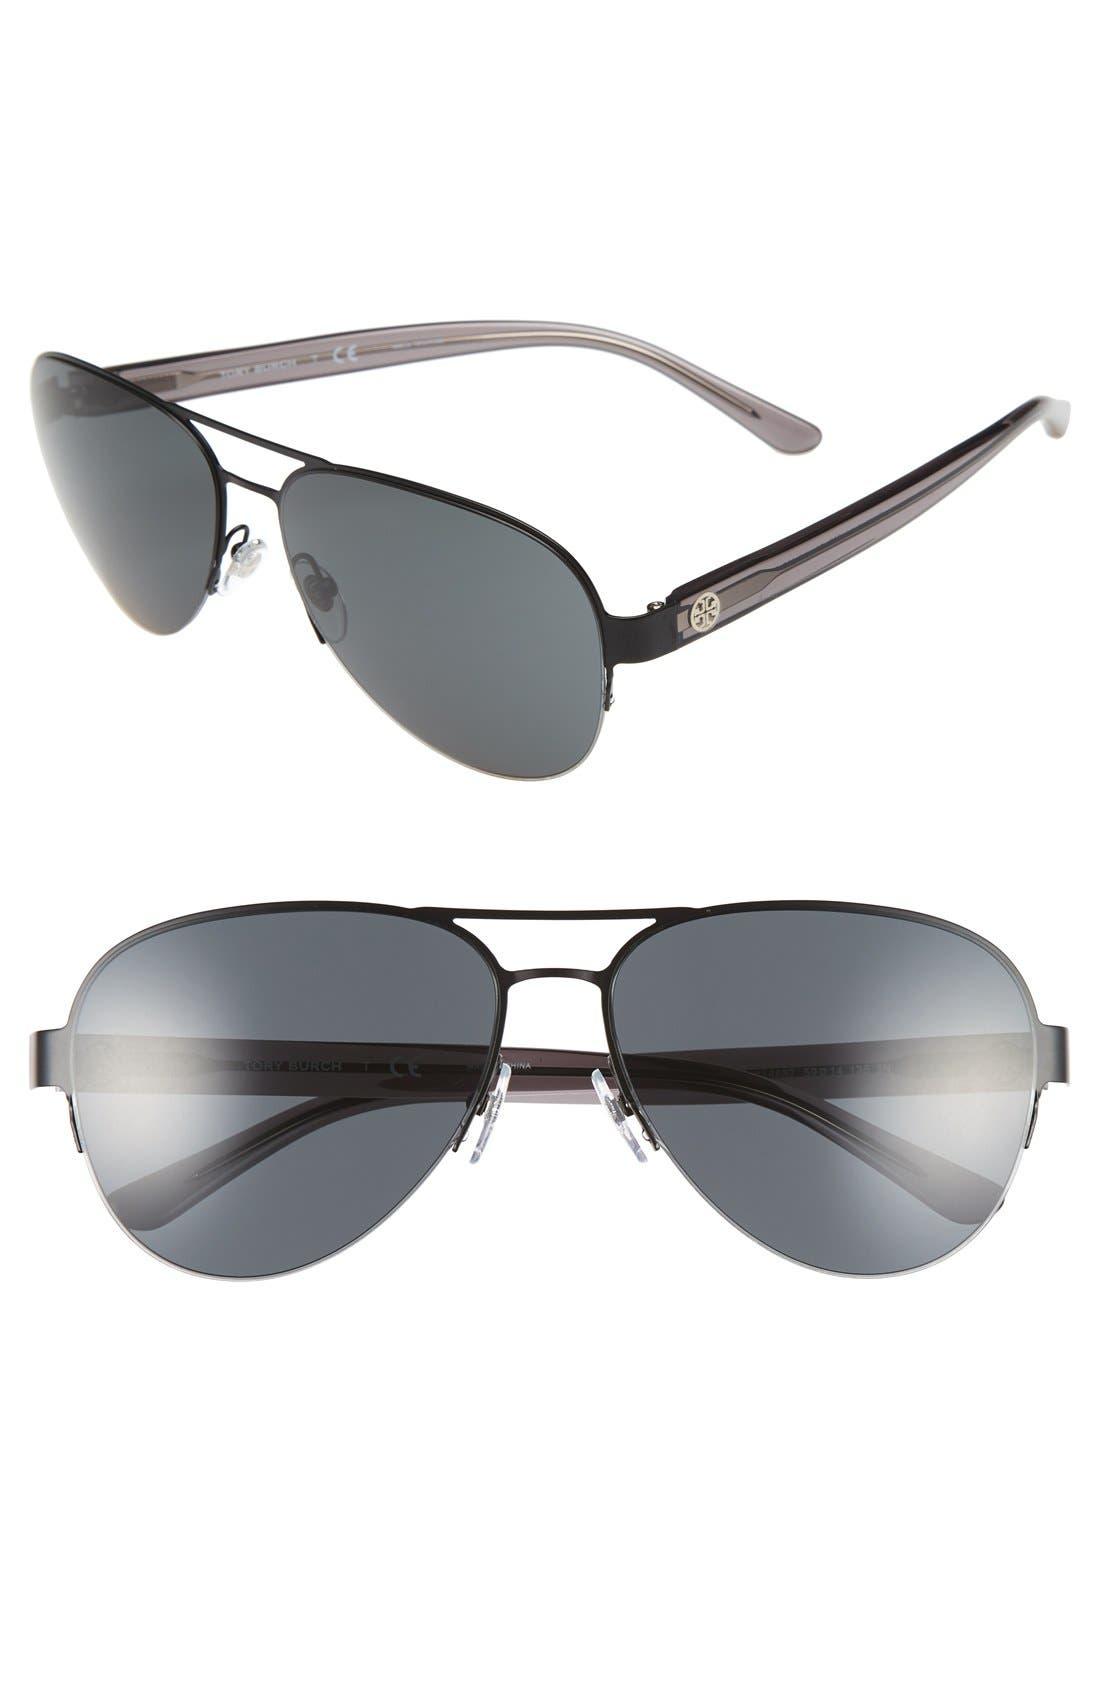 59mm Aviator Sunglasses,                             Main thumbnail 1, color,                             001